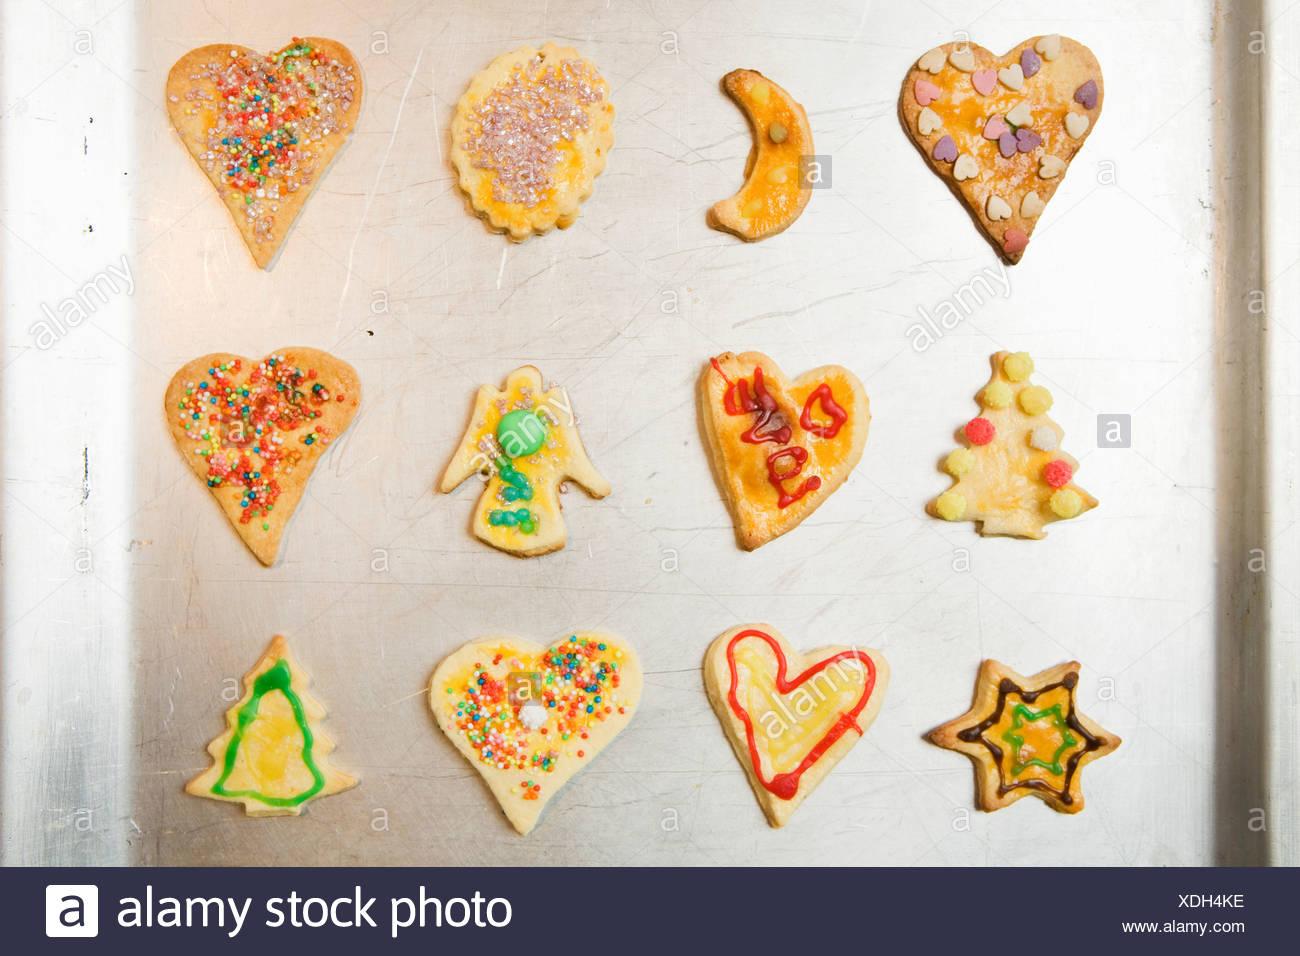 Christmas cookies Stock Photo: 283733282 - Alamy